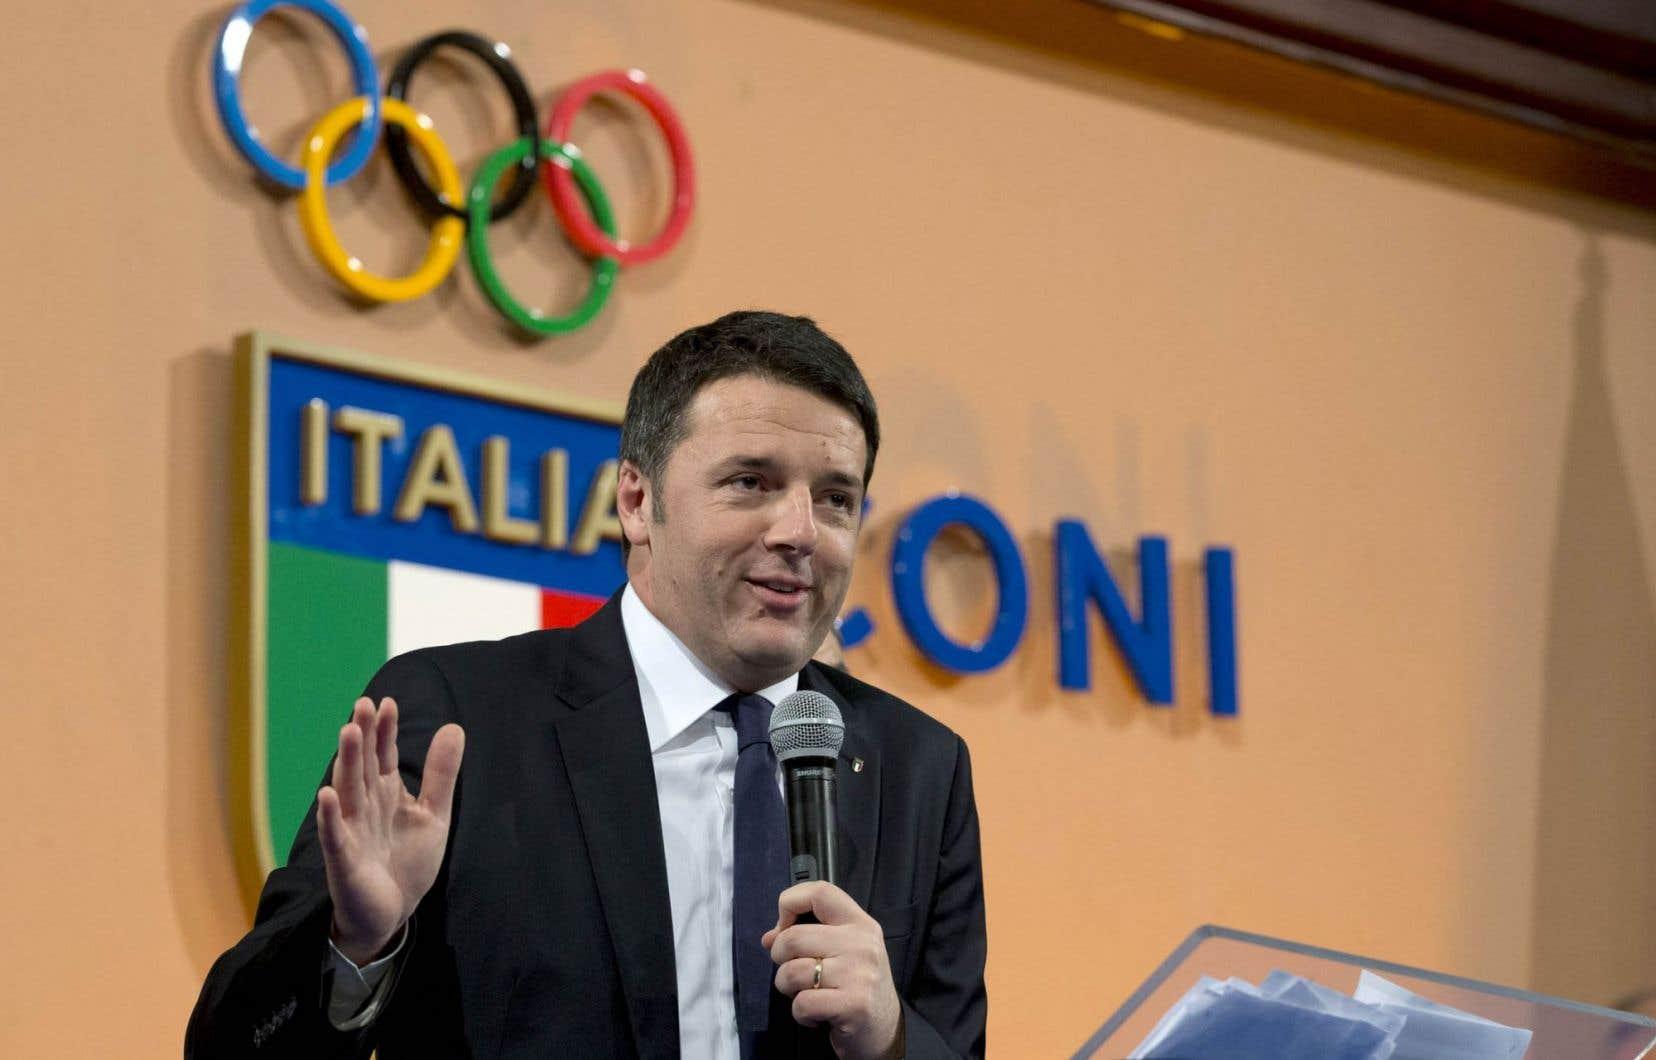 Le premier ministre italien, Matteo Renzi